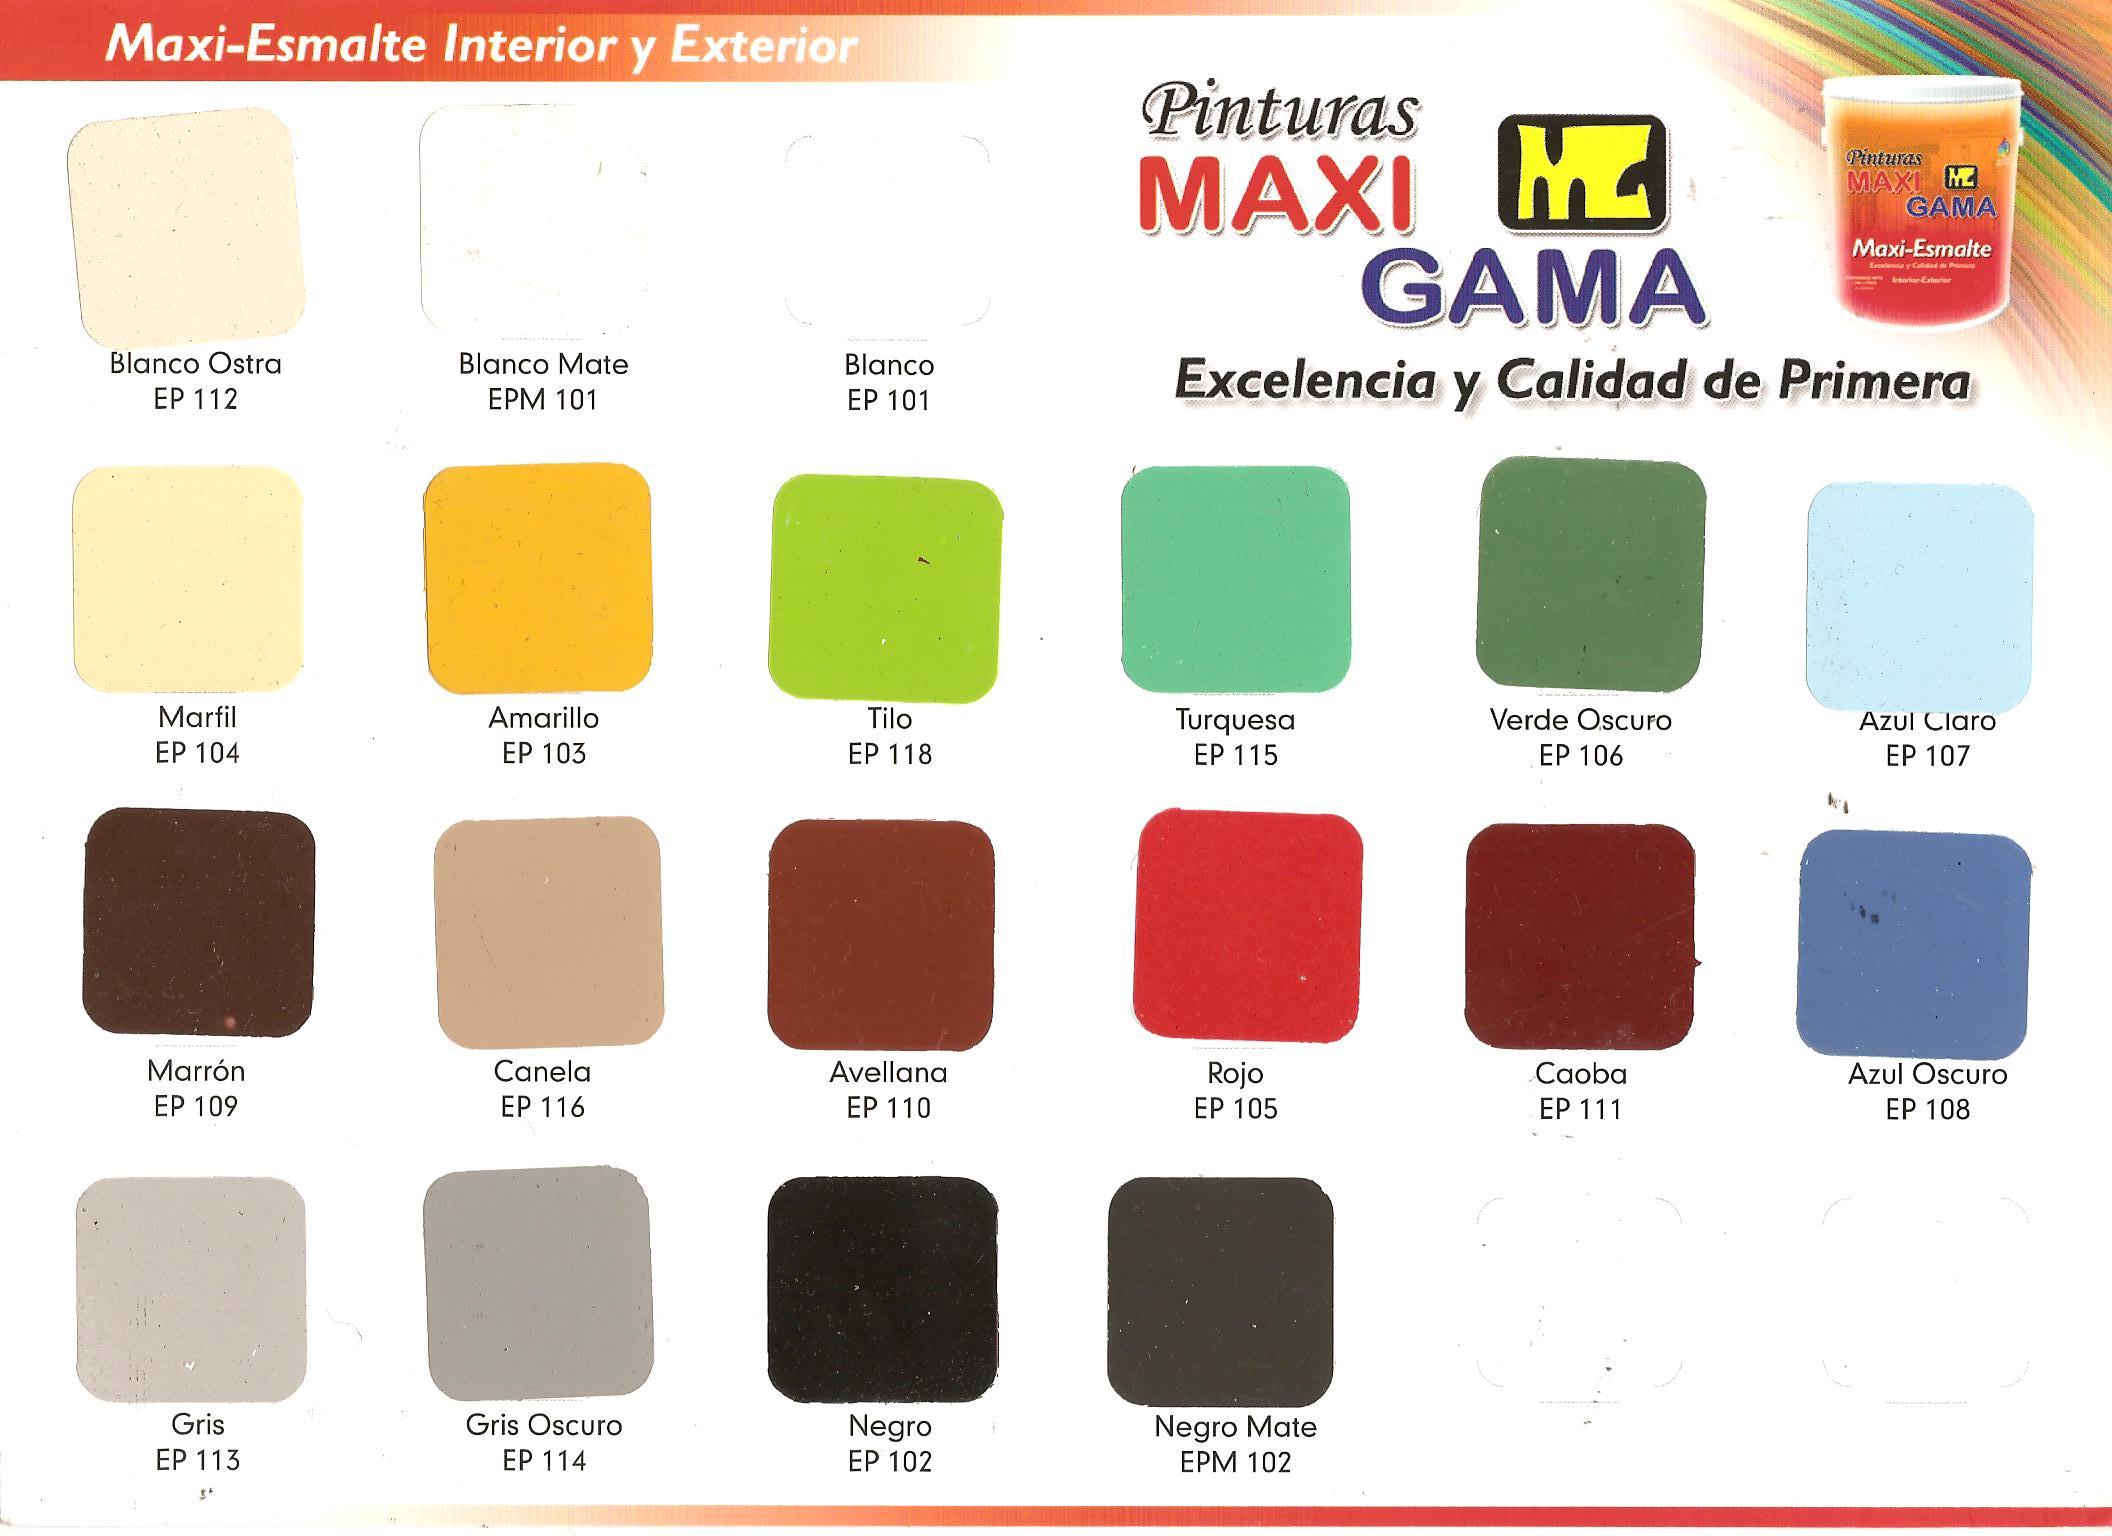 Etiquetas  Fabrica de Pinturas Maxigama